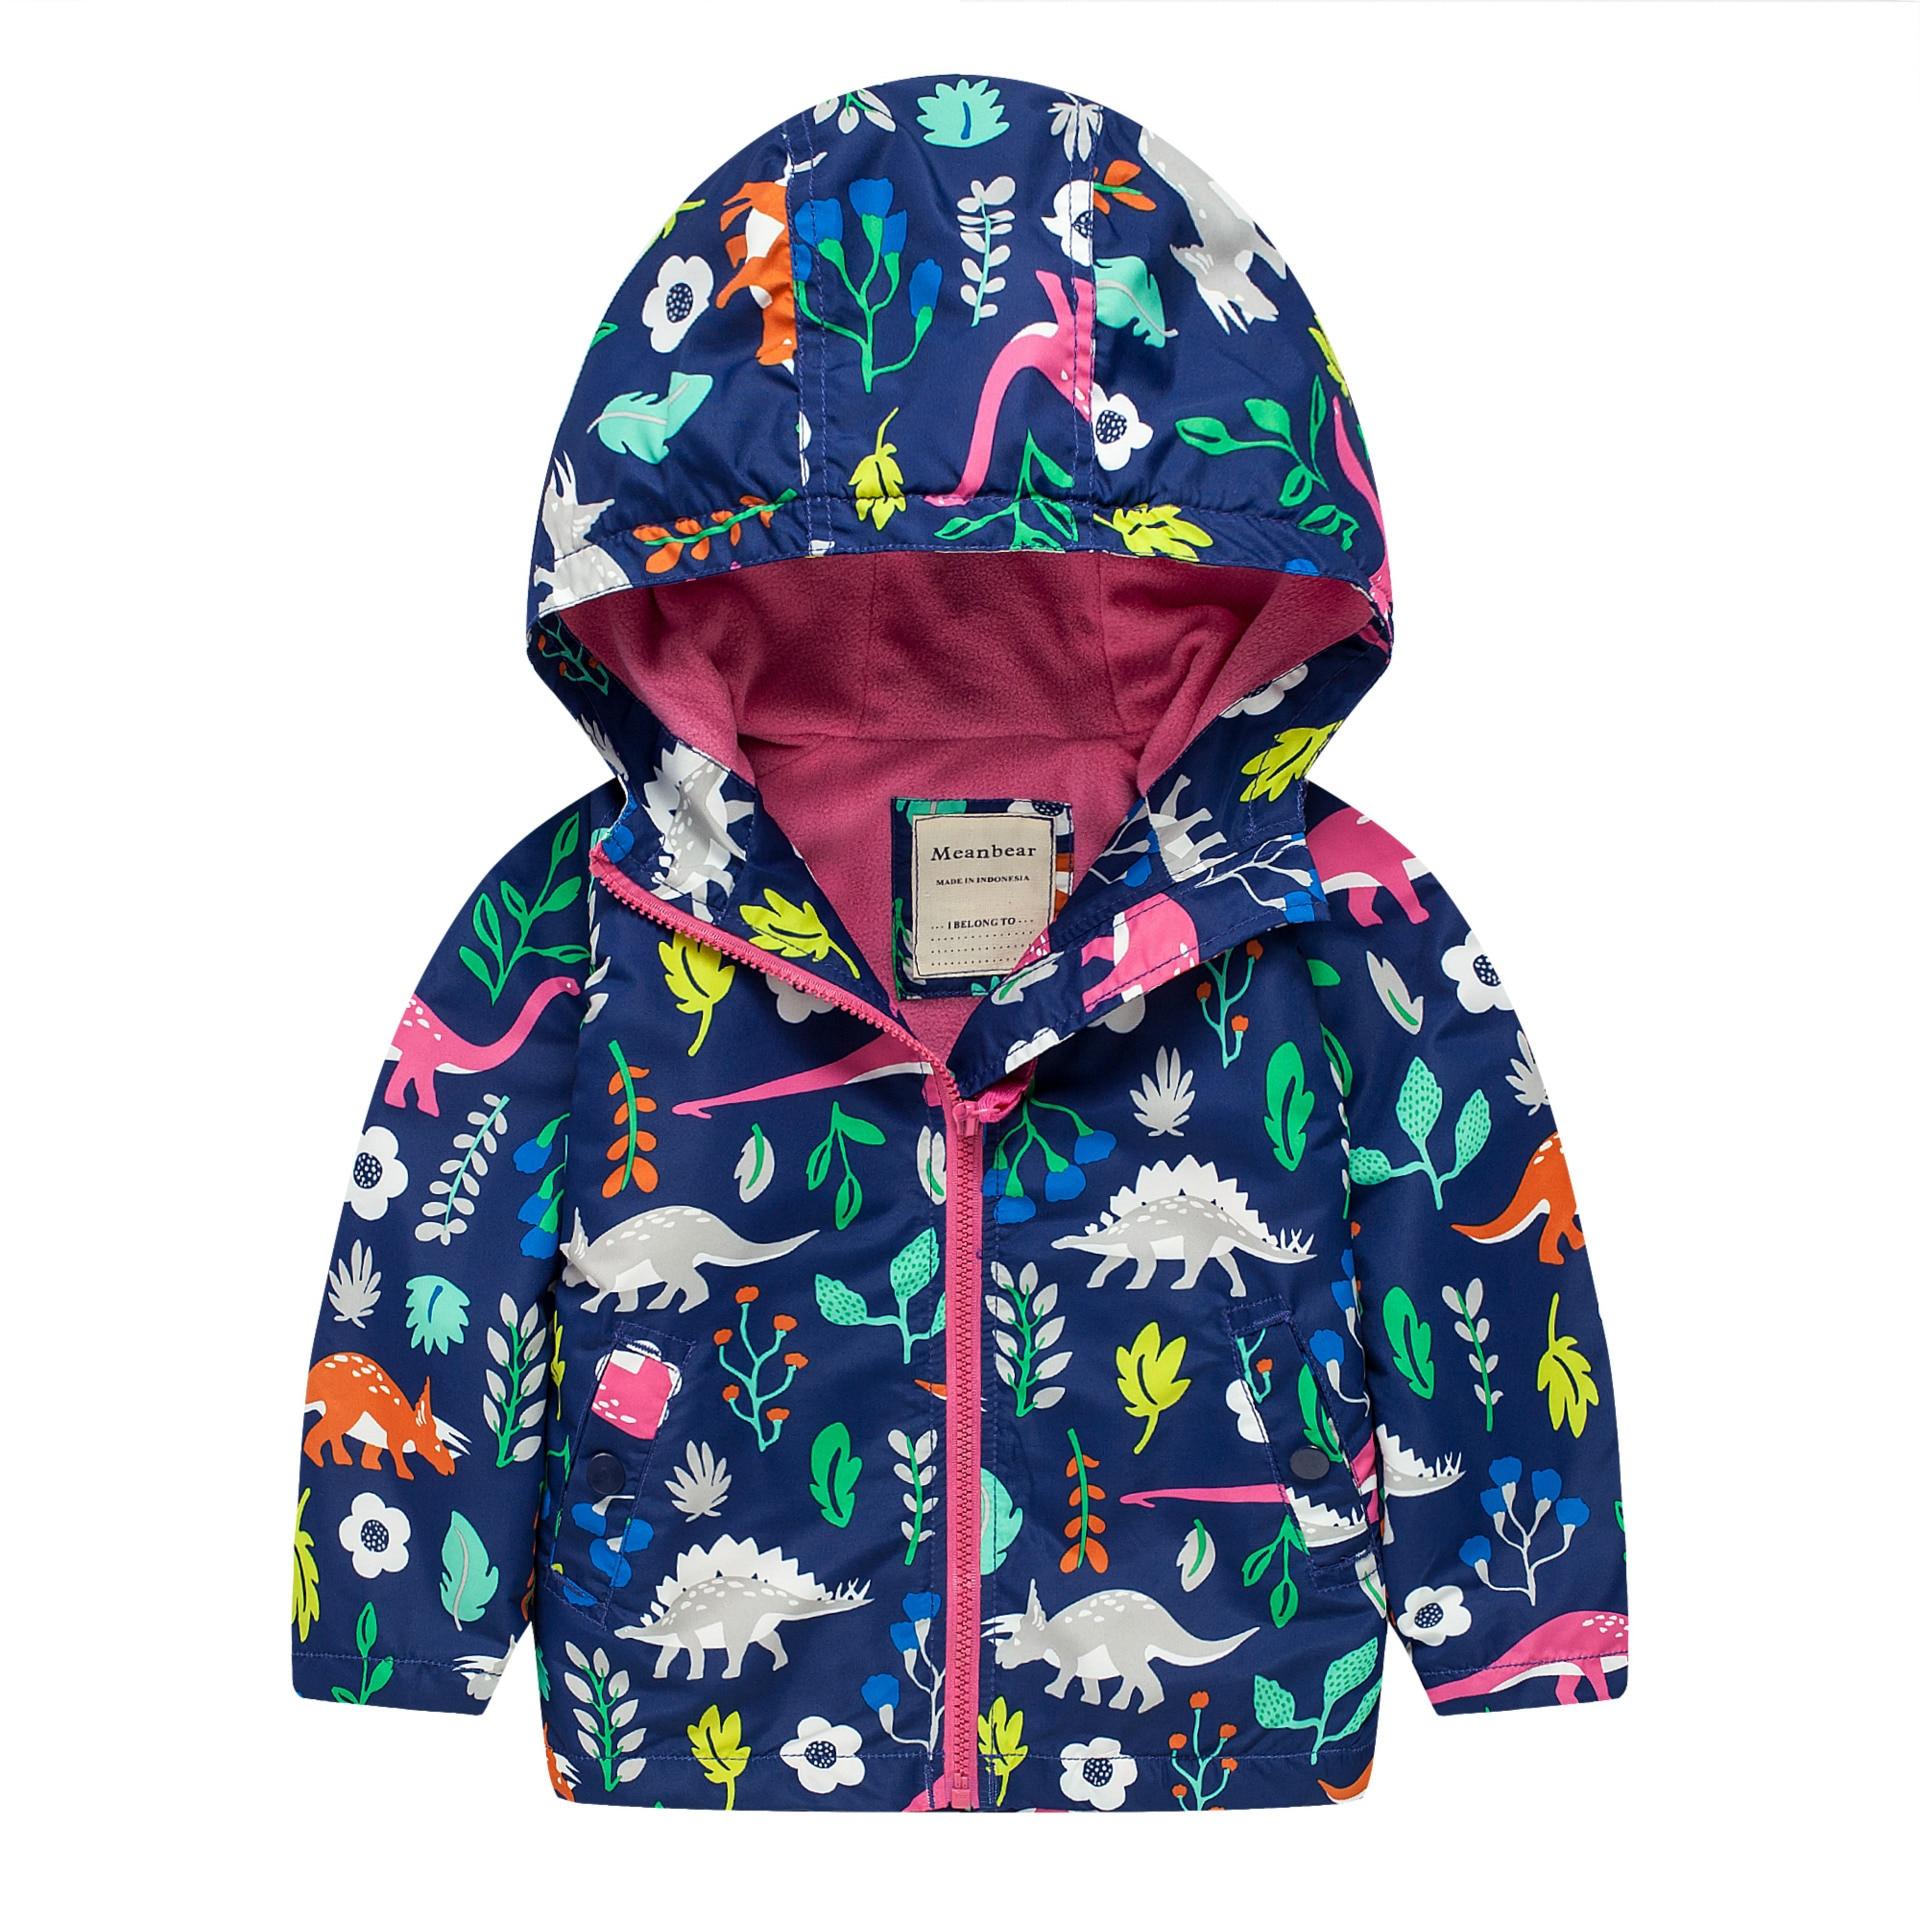 Dames kind plus fluwelen geul 2016 outdoor jas print kind geul - Kinderkleding